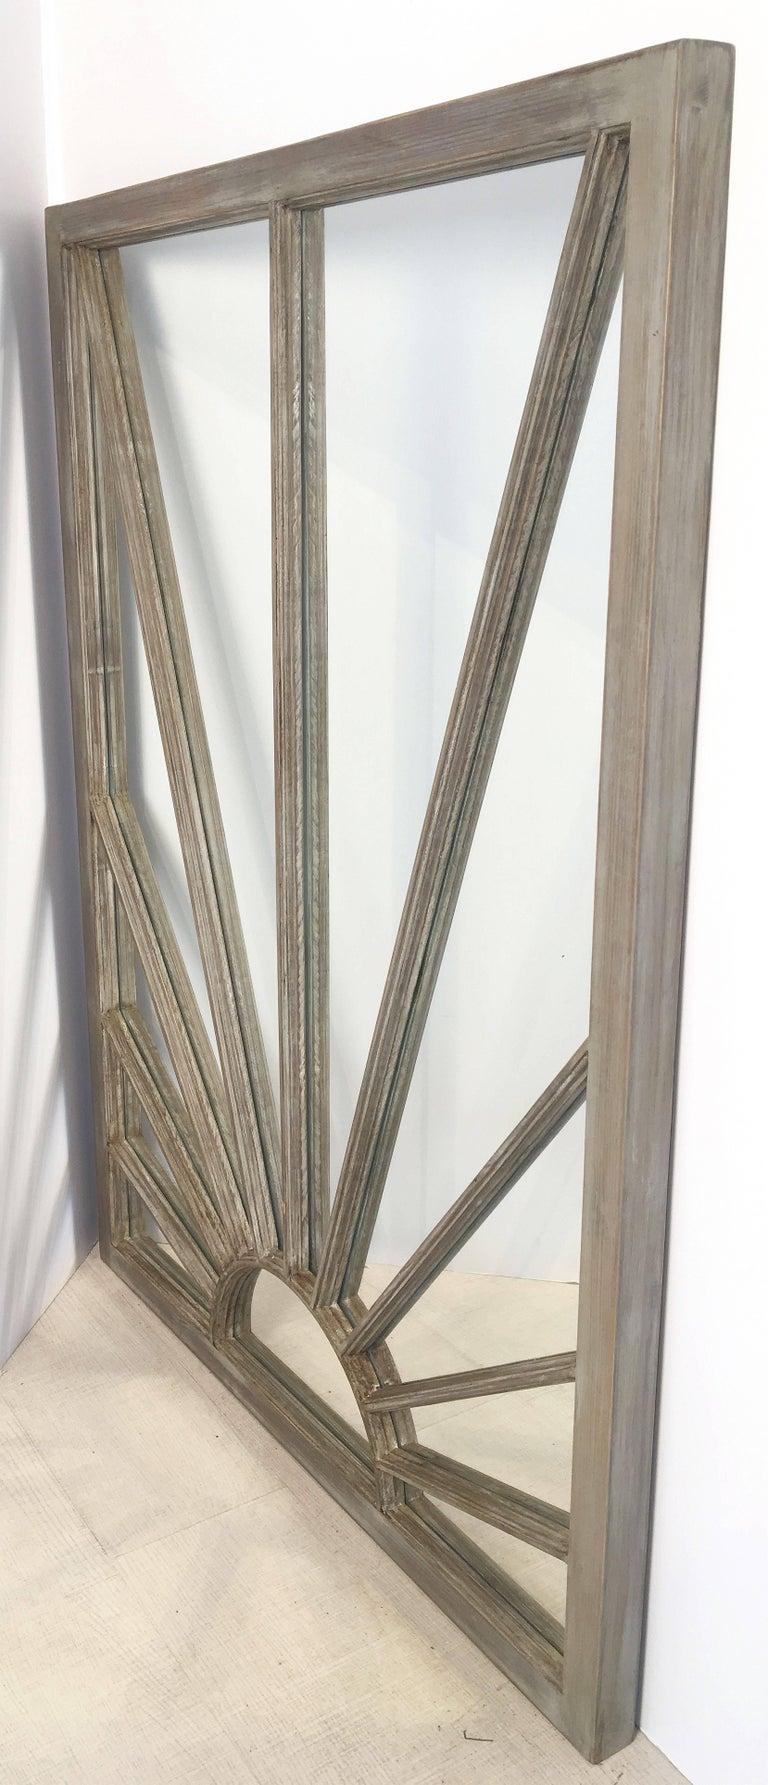 English Rectangular Grey Frame Mirrors (H 48 3/4 x W 35 3/4) For Sale 5